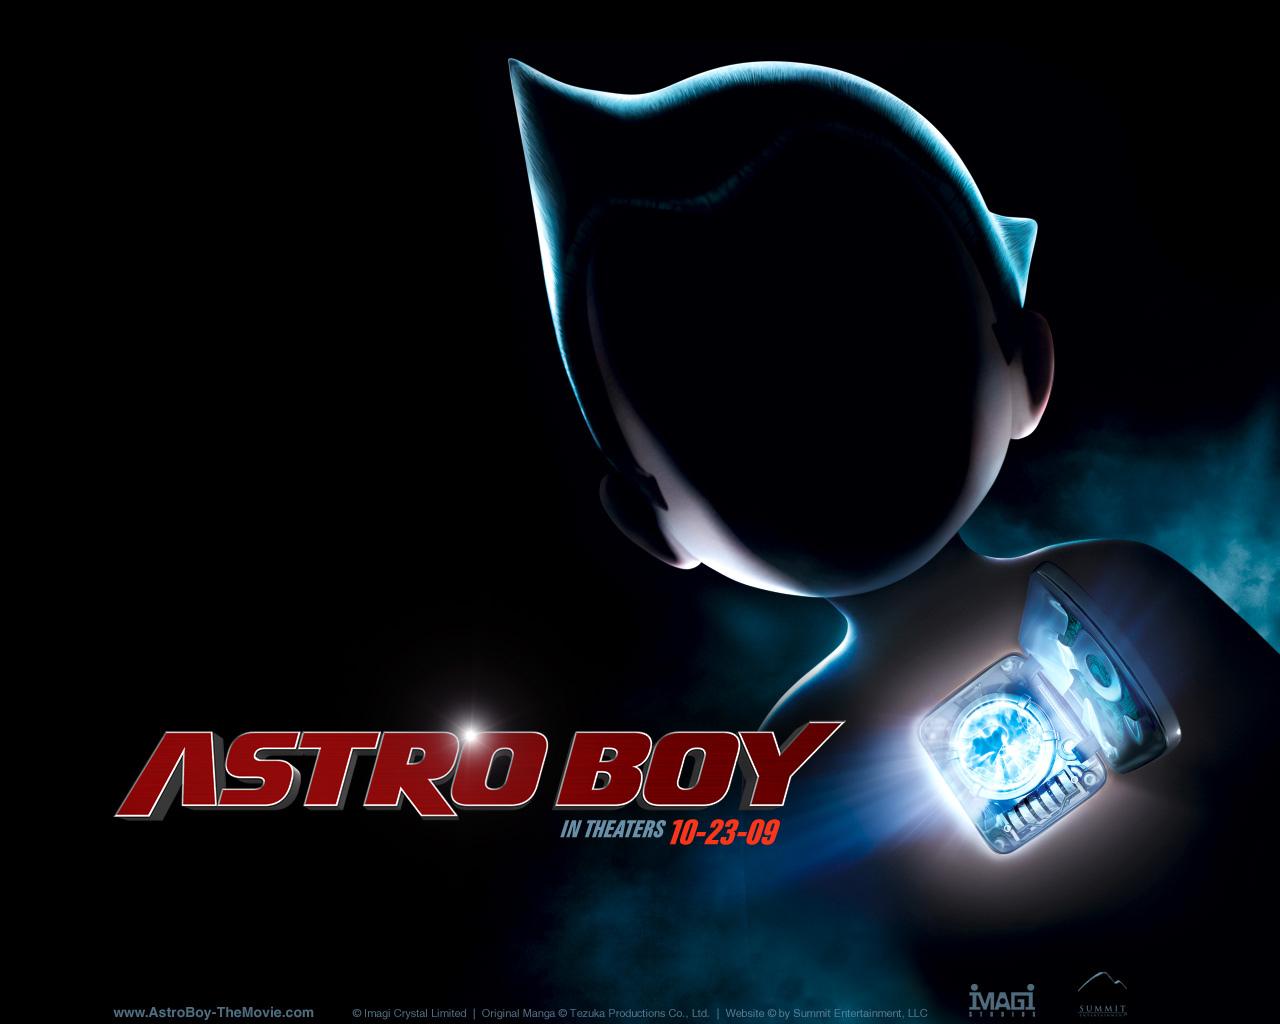 Hd Cool Boy Wallpaper Resenha De Filmes Astro Boy